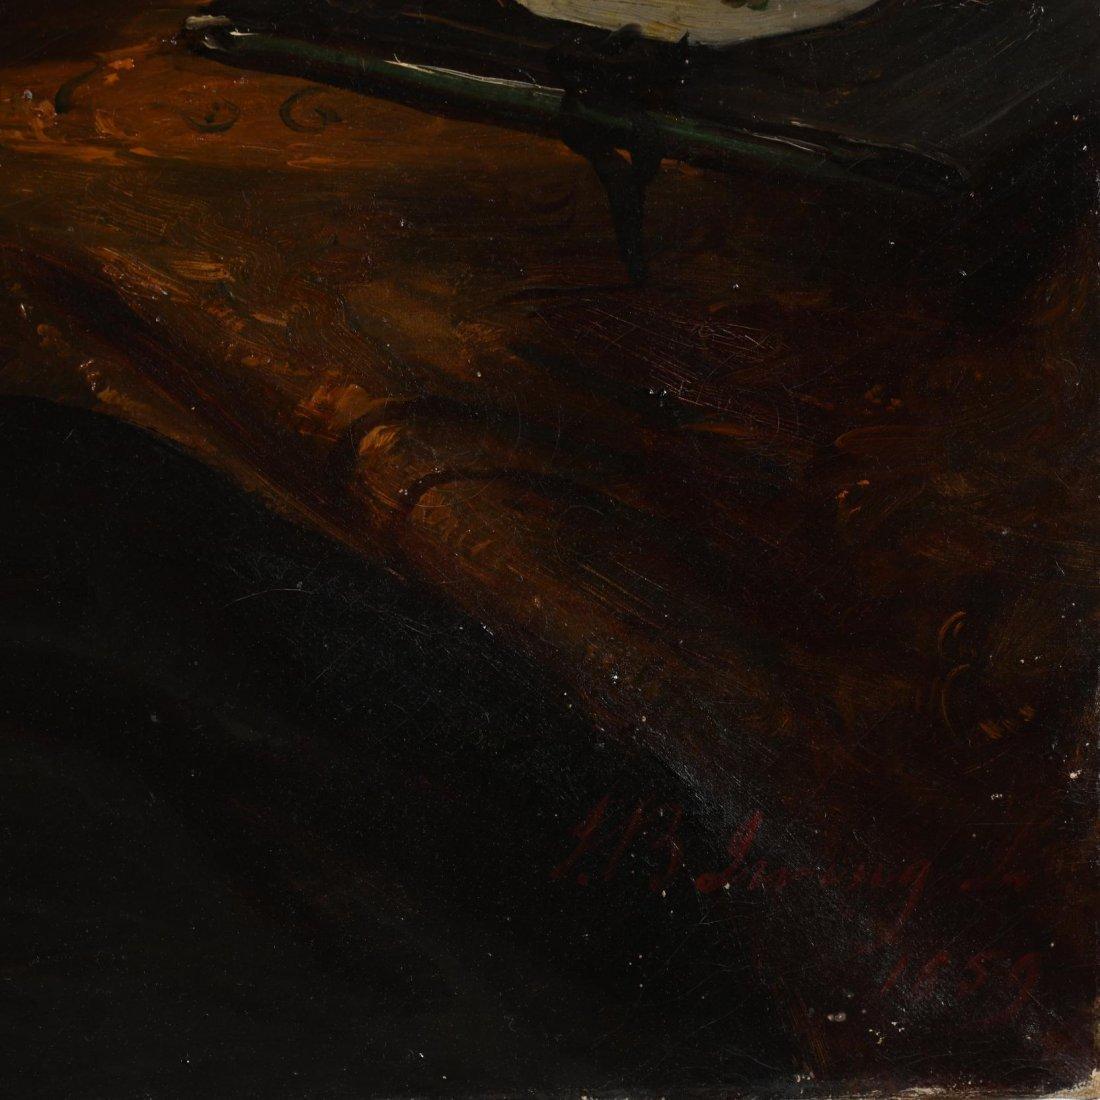 John Beaufain Irving (SC, 1825-1877), Portrait of a - 4